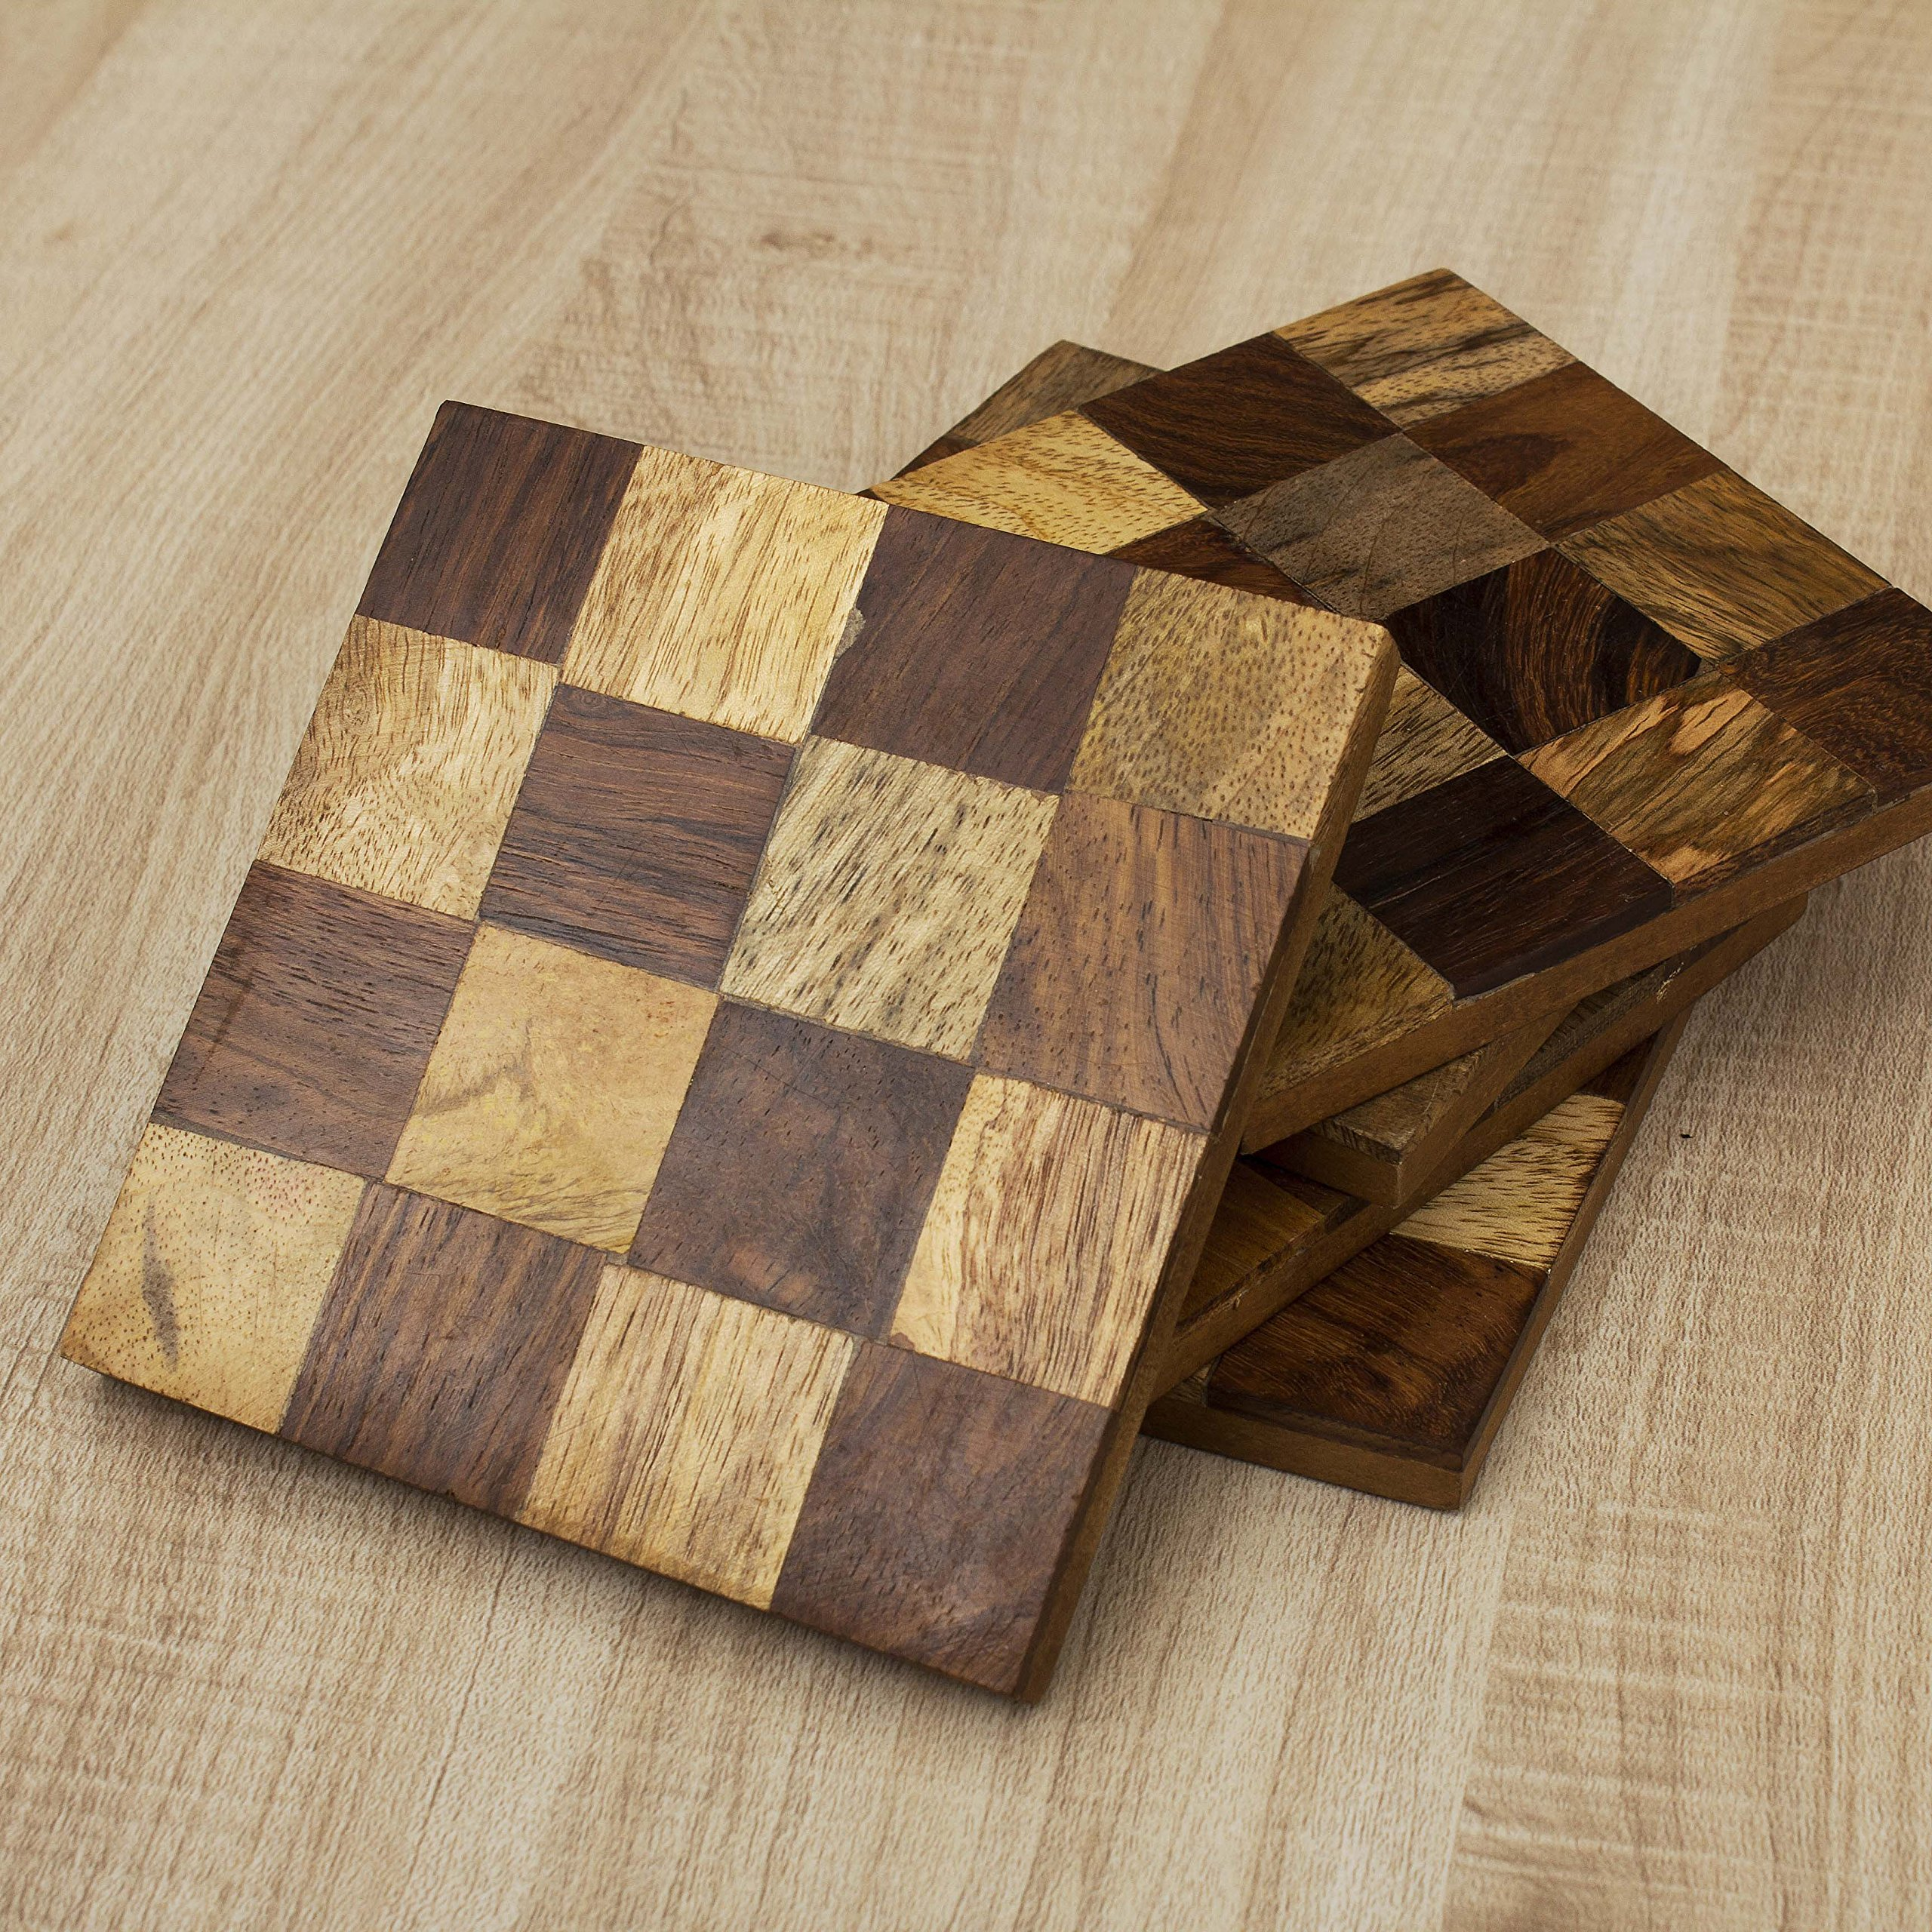 Rusticity Wood Coaster Set of 6 - Square Design | Handmade | (3.7x3.7 in)